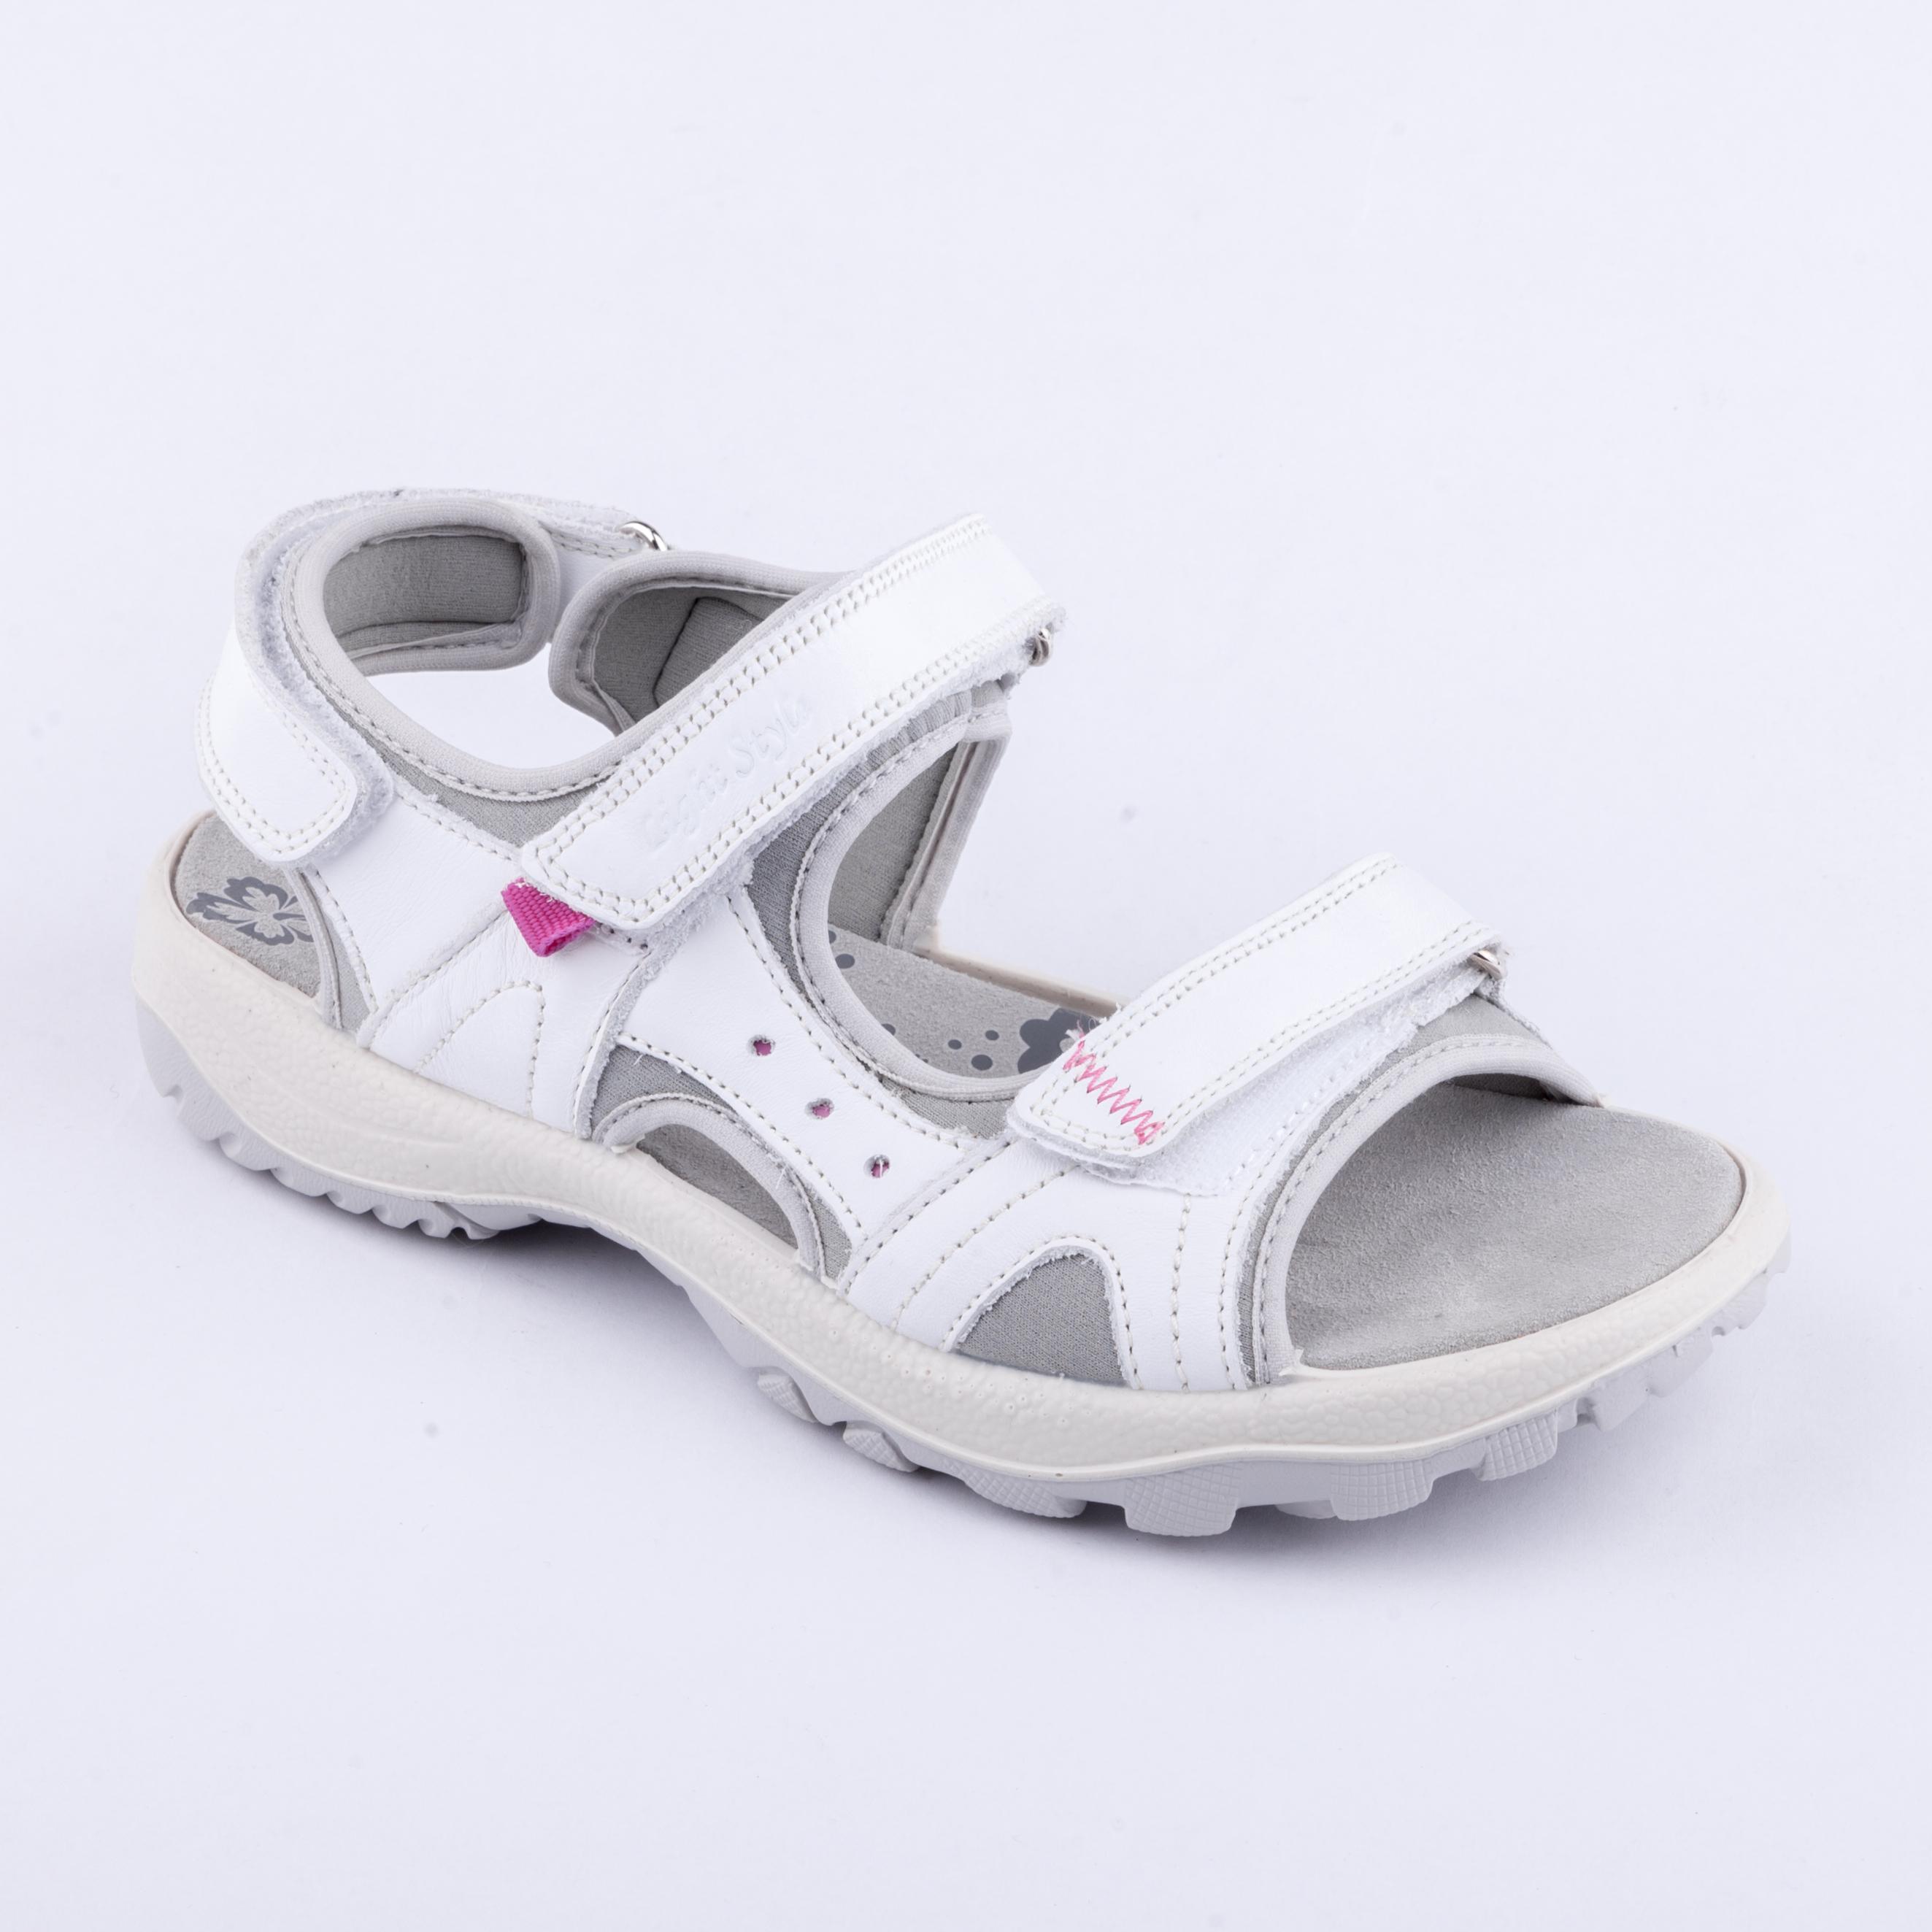 c6edb6945b Bílý letní sandál Imac 7100214